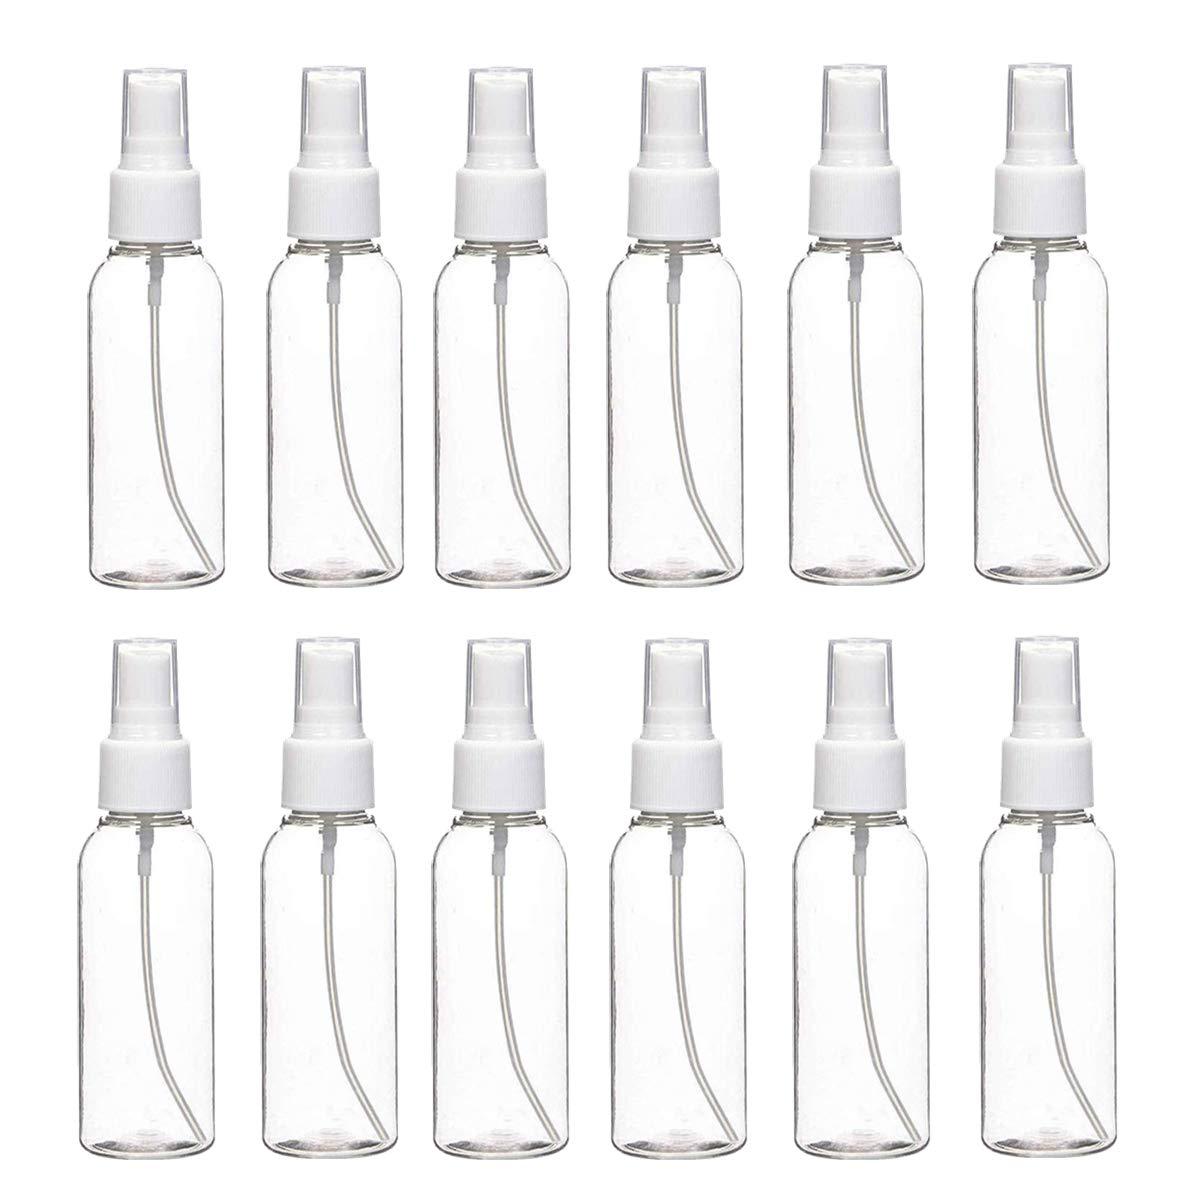 Spray Bottle, BYWORLD 3.4oz/100ml 12 Pack Plastic Spray Bottle Travel Bottles, Empty Spray Bottles for Travel, Business, Home and Outdoor, Fine Mist Spray Bottles